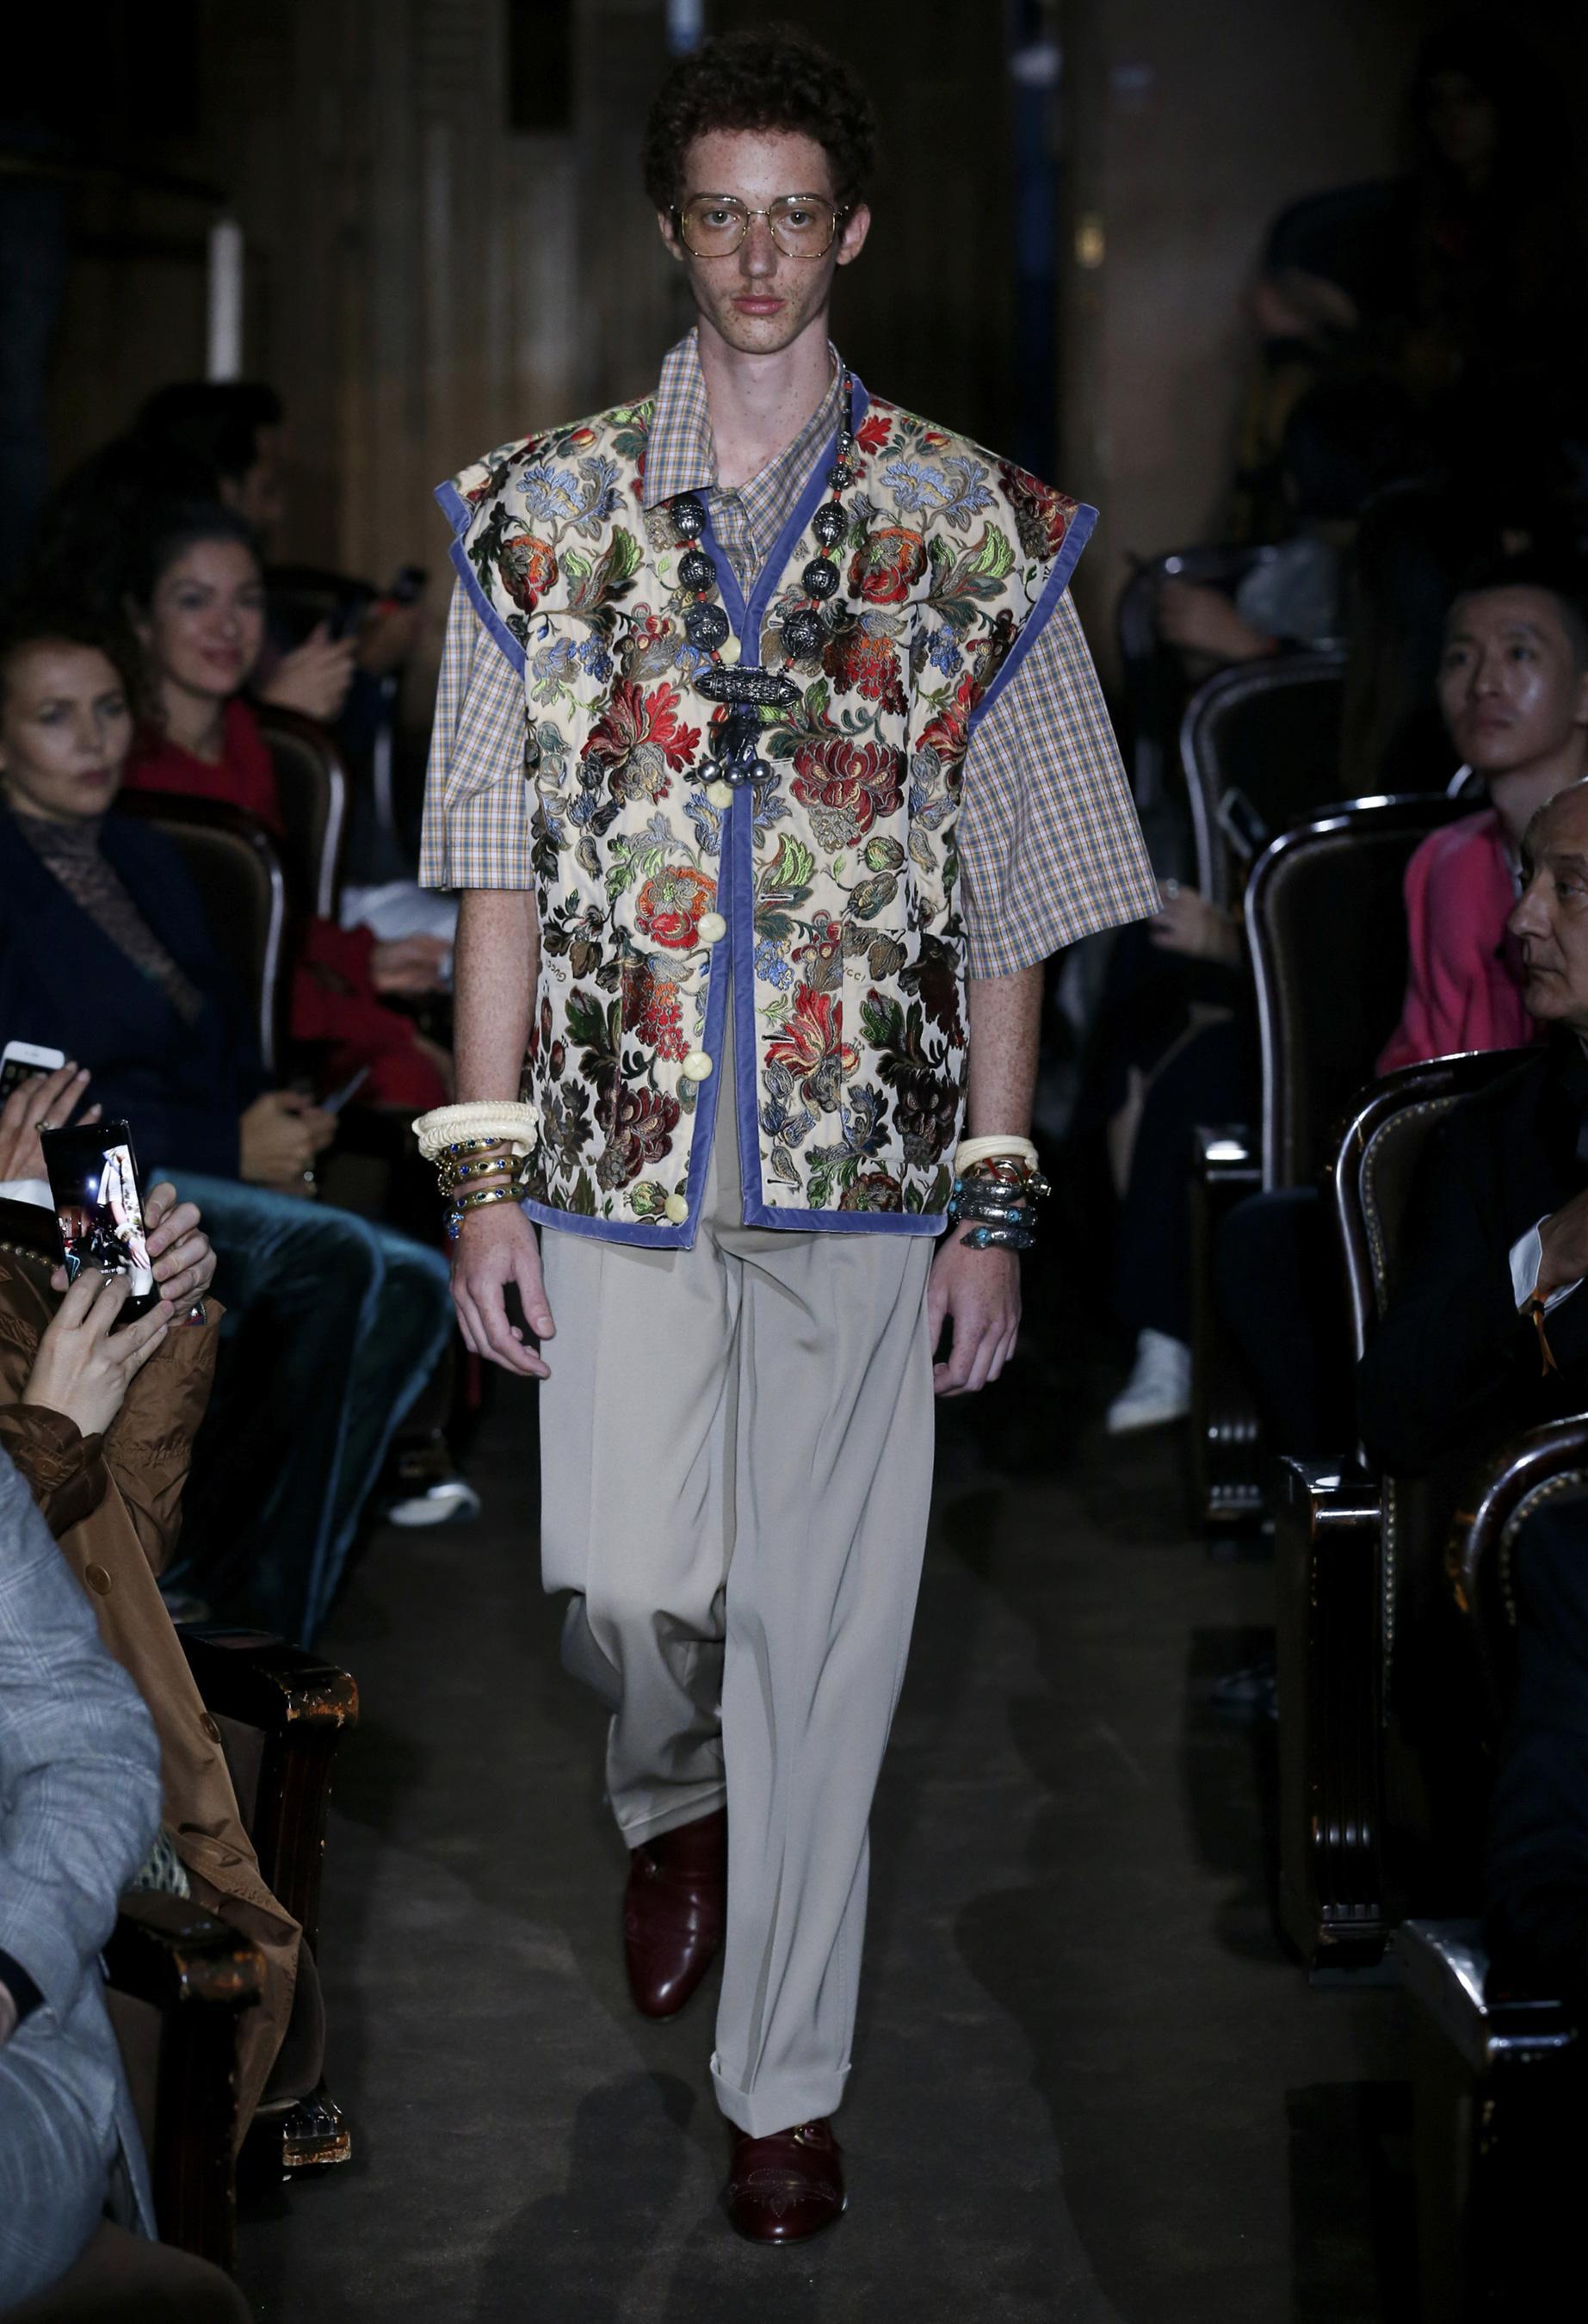 Défilé Gucci printemps-été 2019 Prêt-à-porter - Madame Figaro eb6ca177a93f